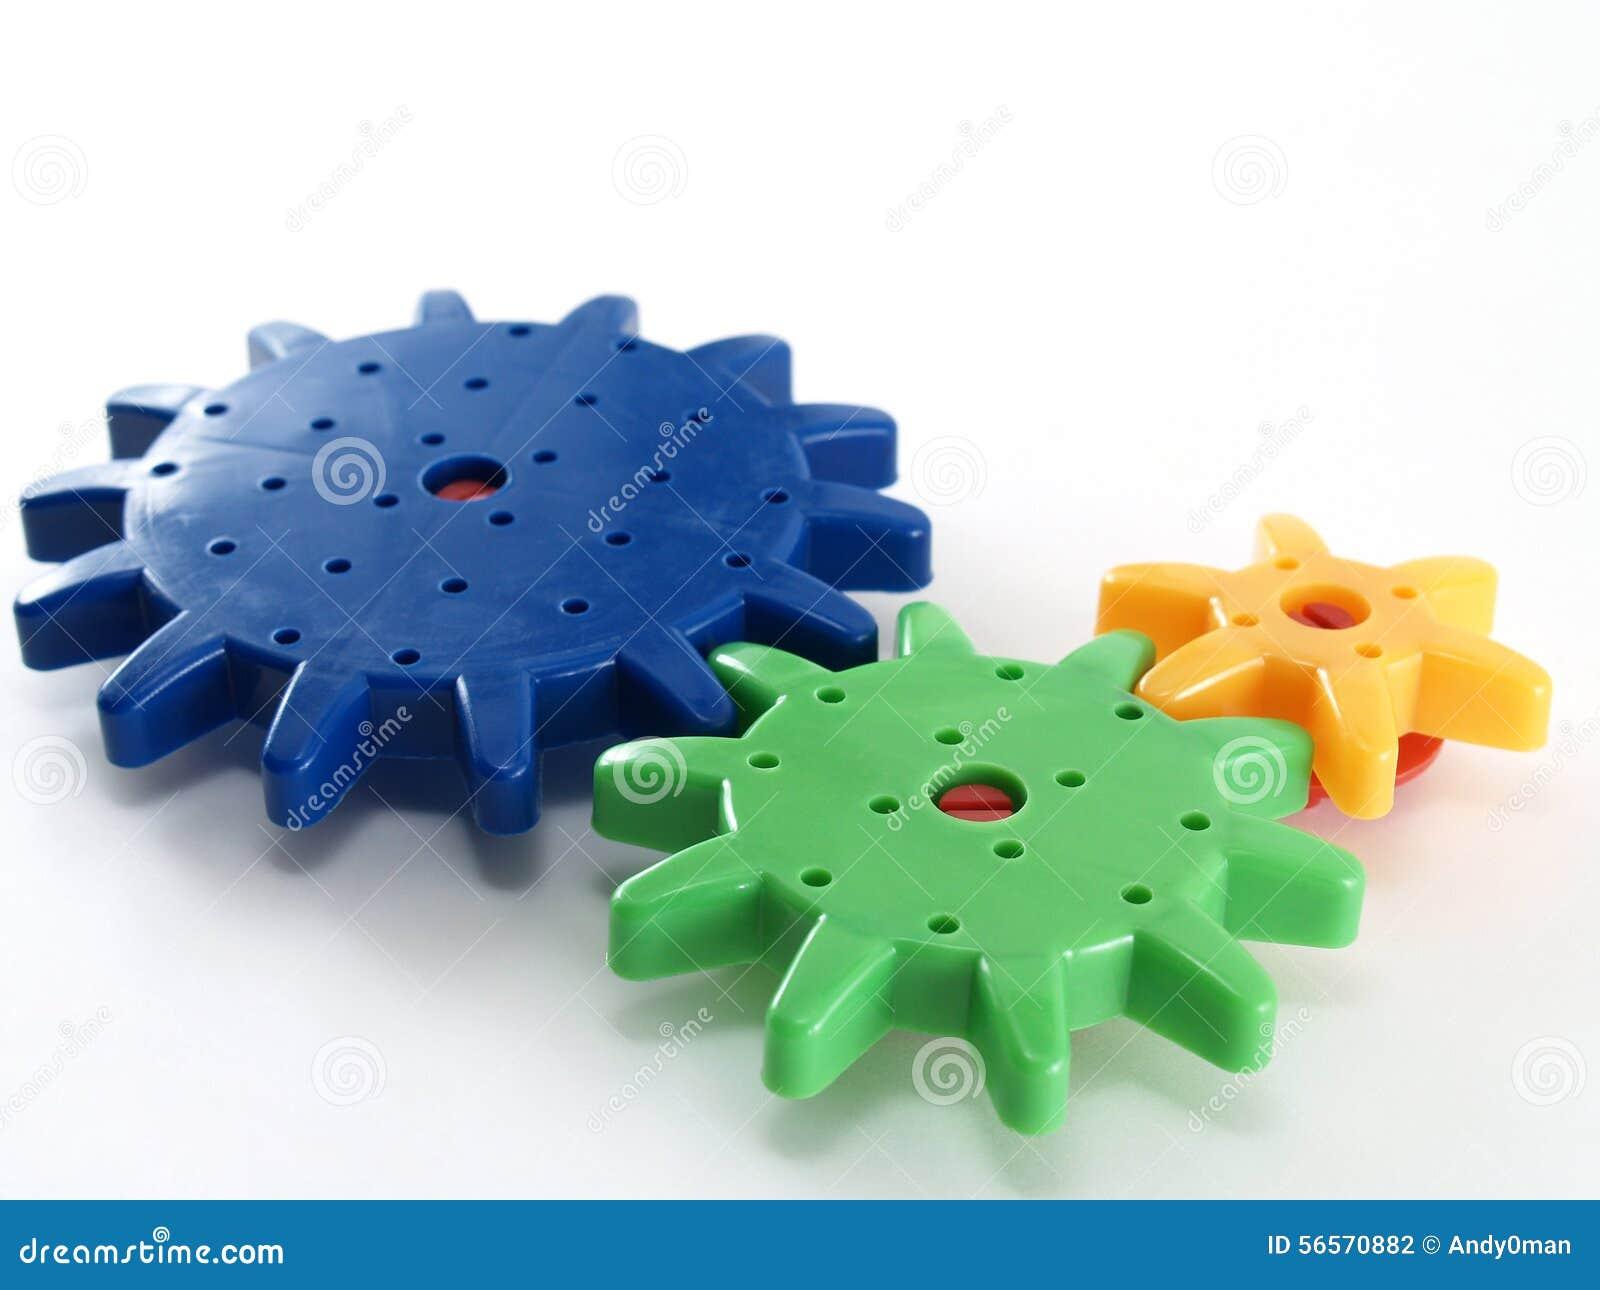 Download πλαστικό εργαλείο στοκ εικόνες. εικόνα από ομάδα, εργαλείο - 56570882